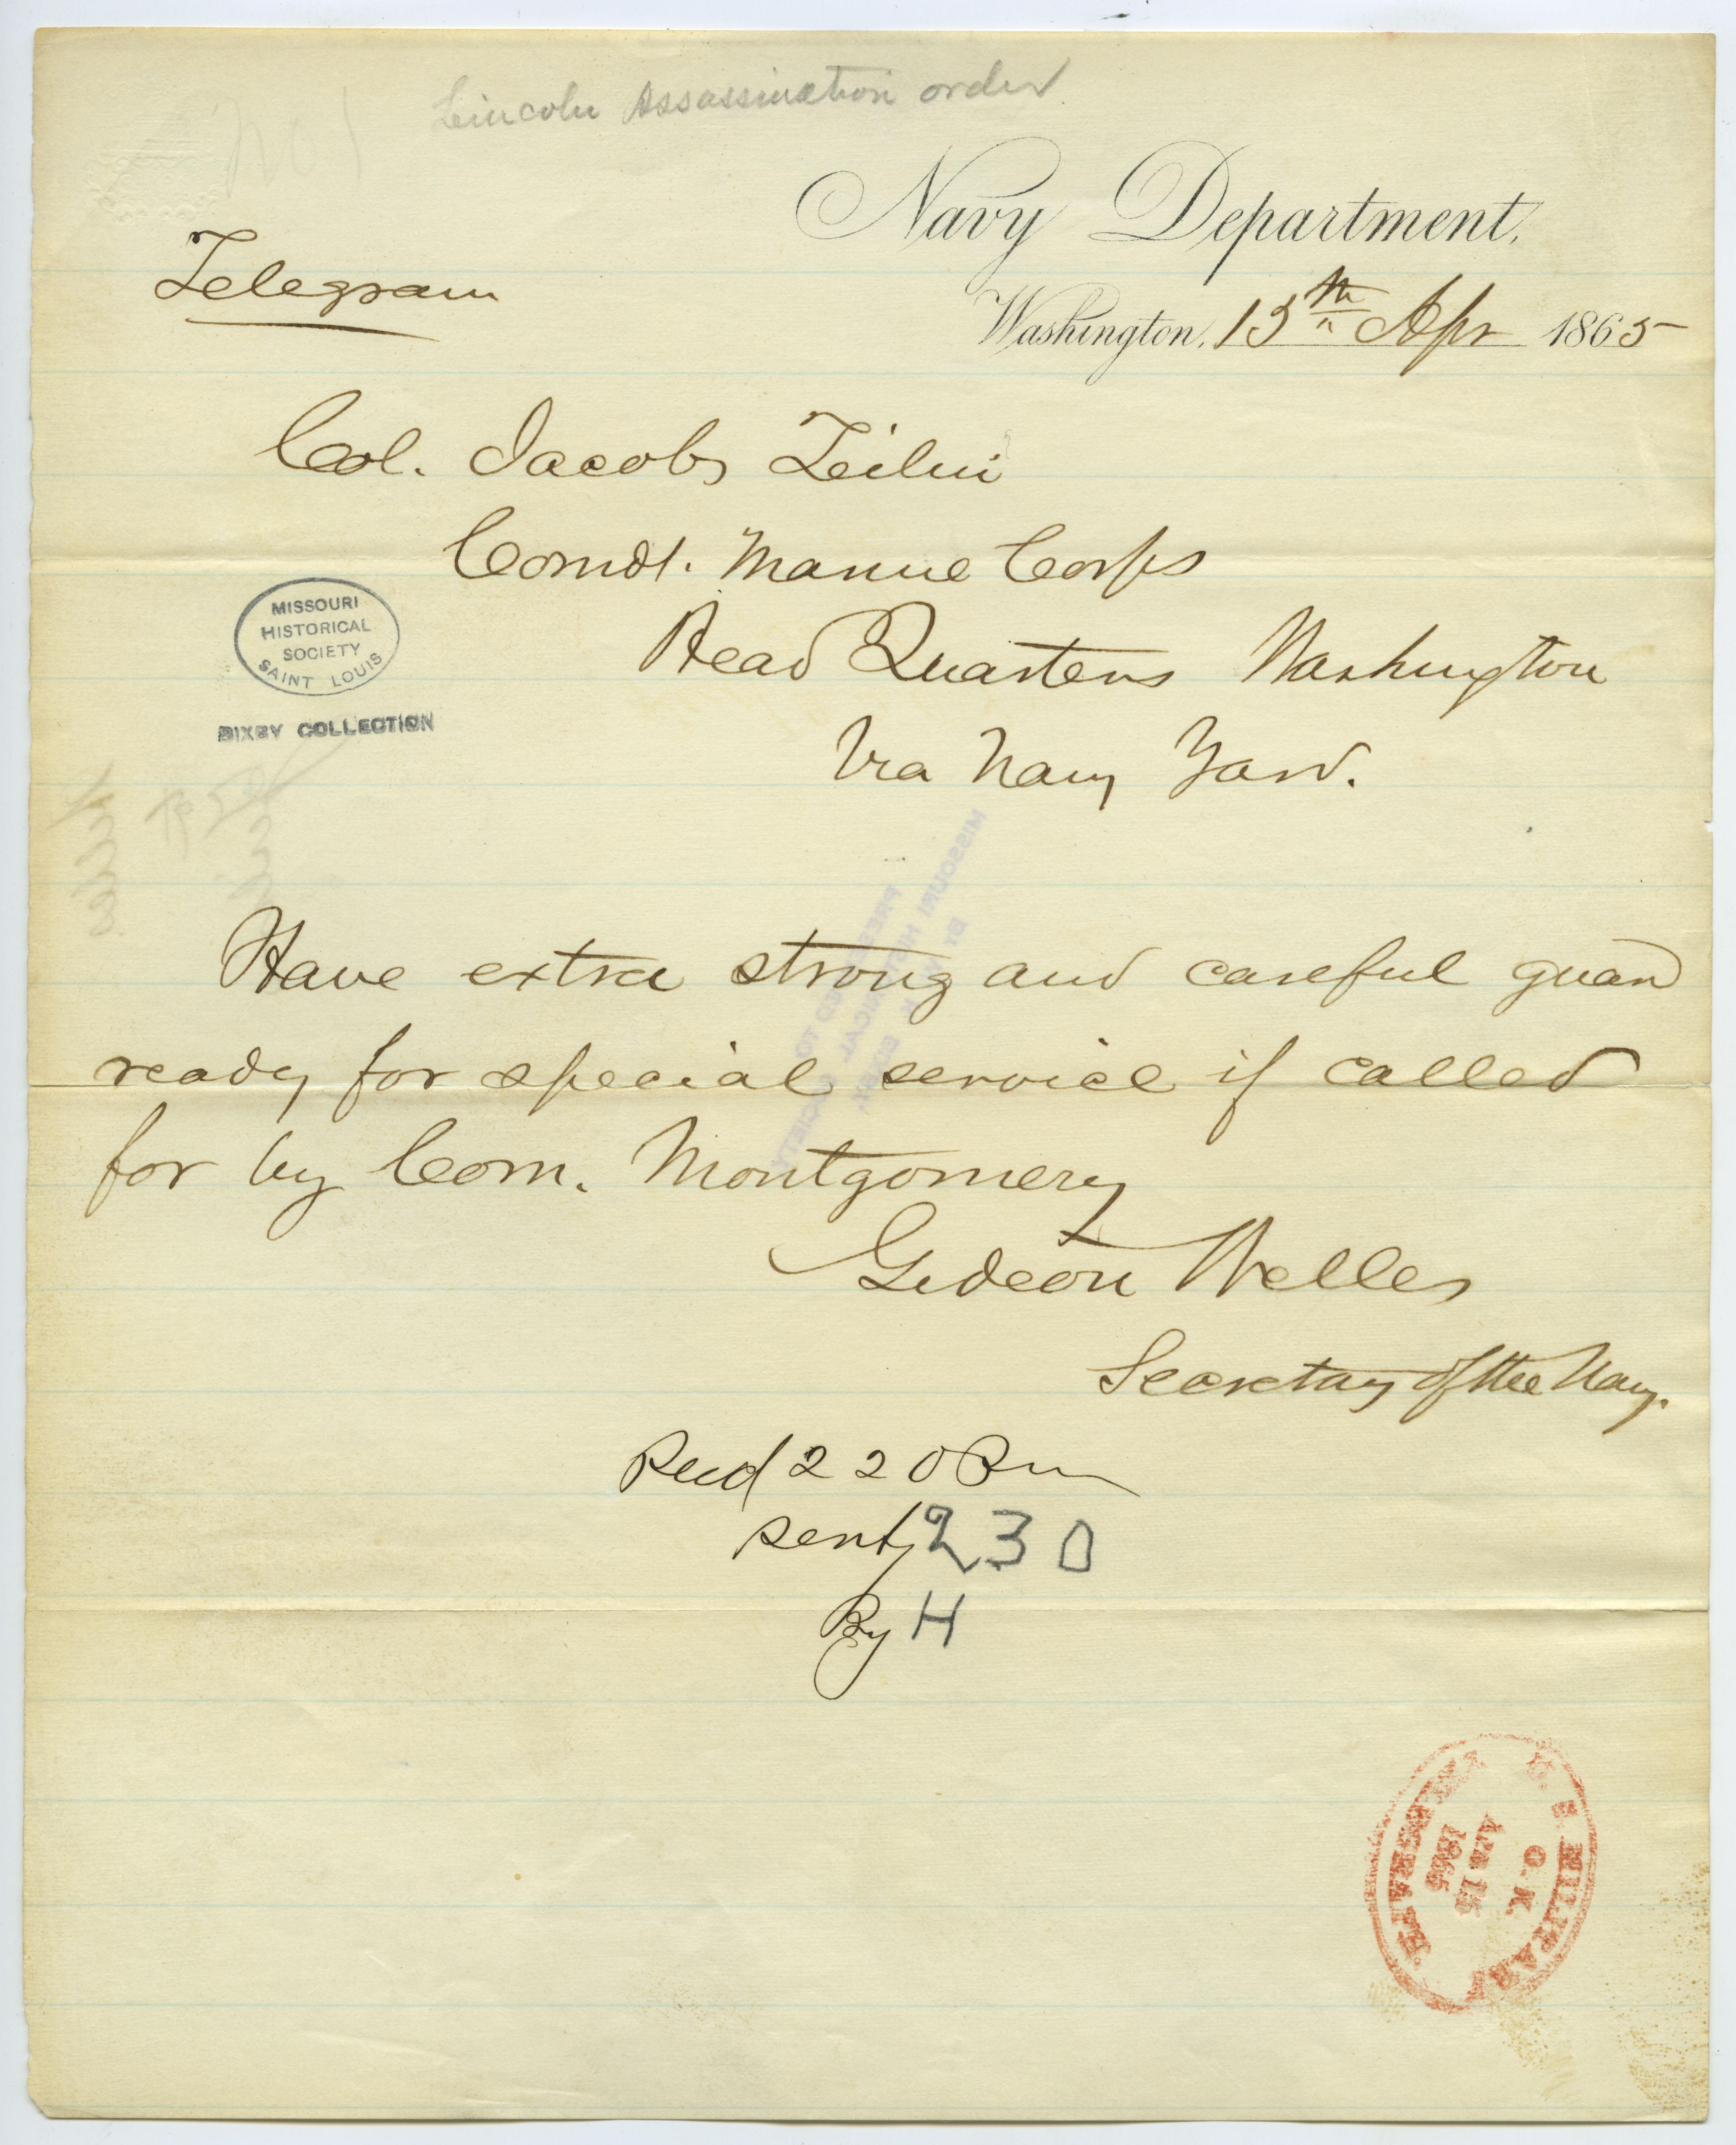 Telegram of Gideon Welles, Navy Department, Washington, to Col. Jacob Teilan, Comdr. Marine Corps, Head Quarters, Washington via Navy Yard, April 15, 1865